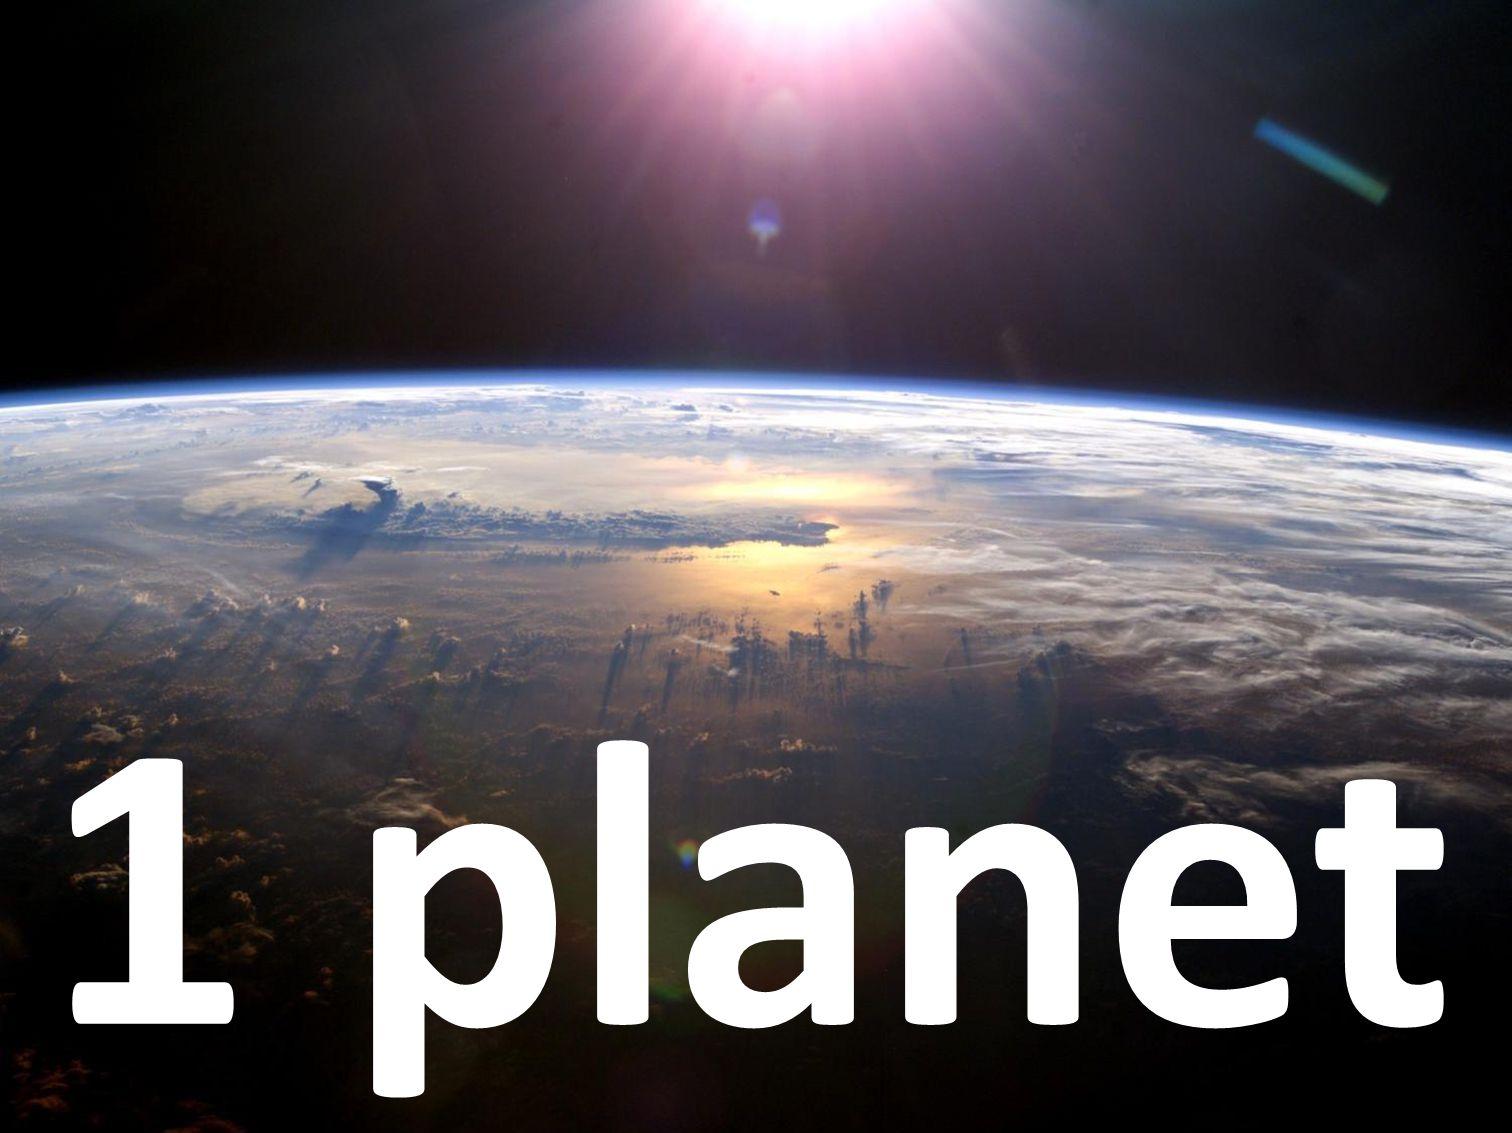 1 planet